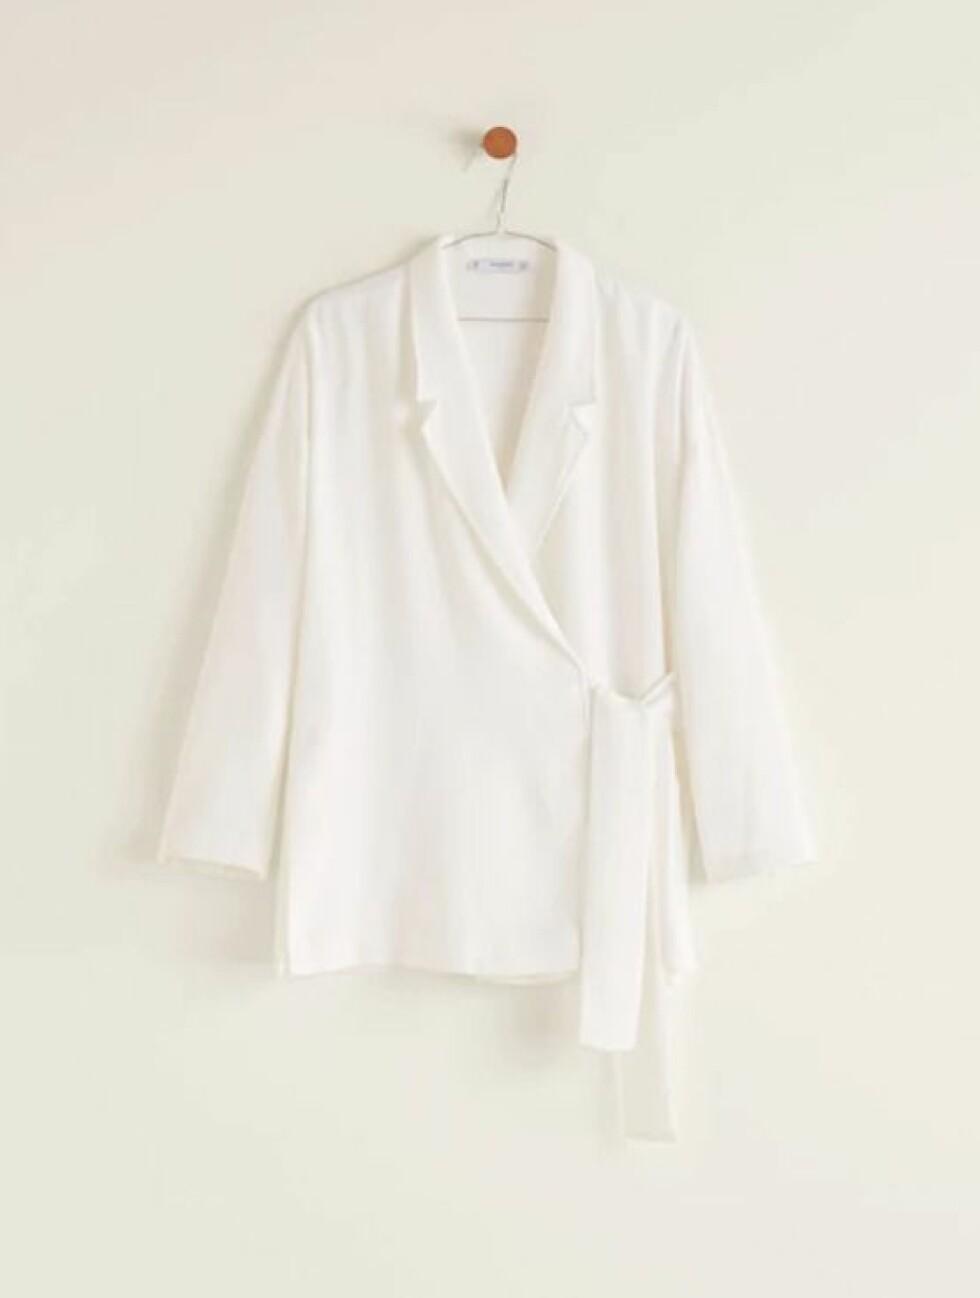 <strong>Blazer fra Mango  350,-  https:</strong>//shop.mango.com/no-en/women/jackets-blazers/unstructured-bow-blazer_31050957.html?c=02&n=1&s=prendas_she.familia;16,304